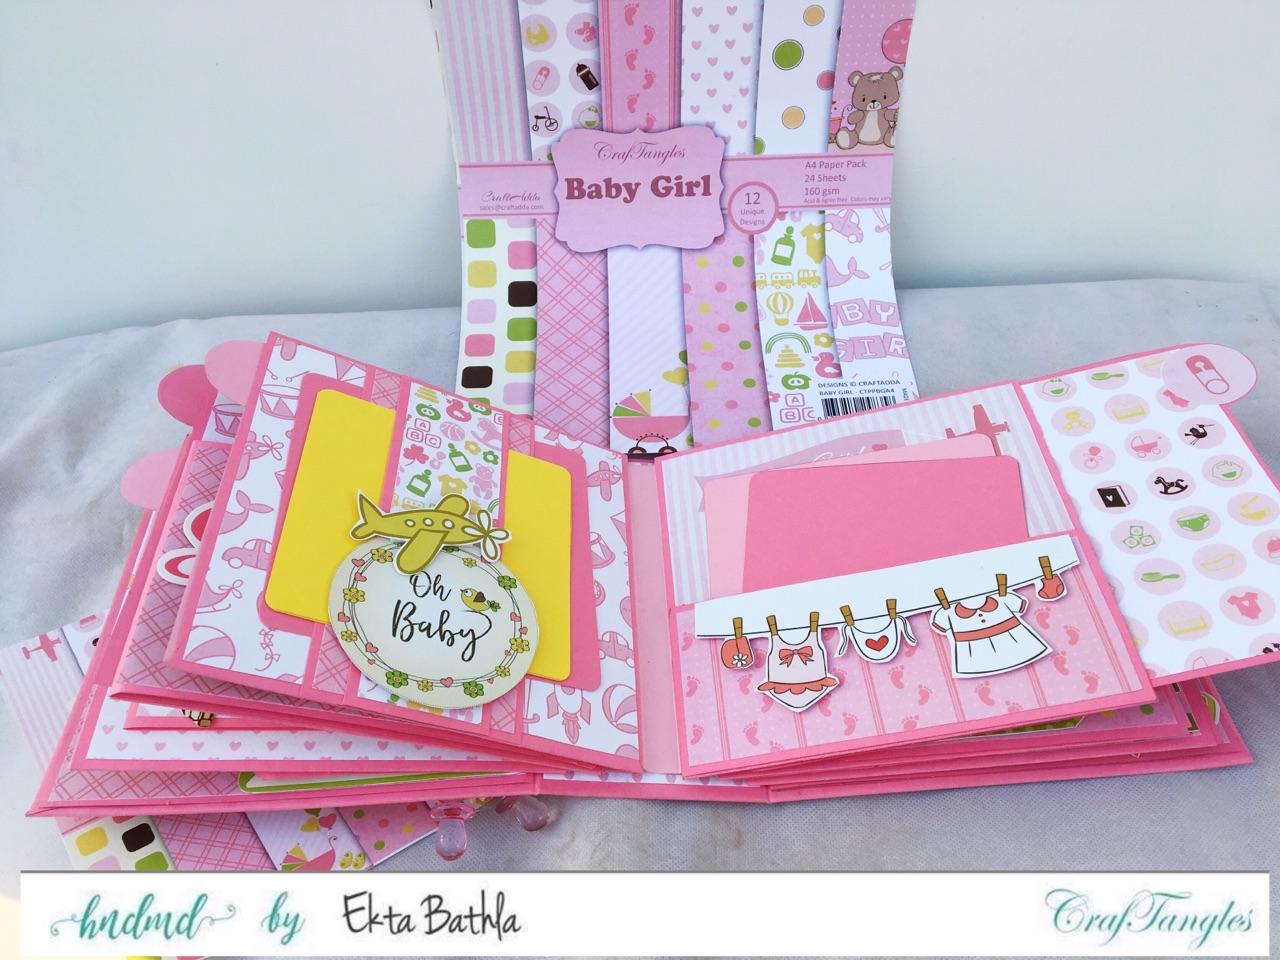 Baby Girl mini album showcasing Baby Girl Elements Pack by CrafTangles 3